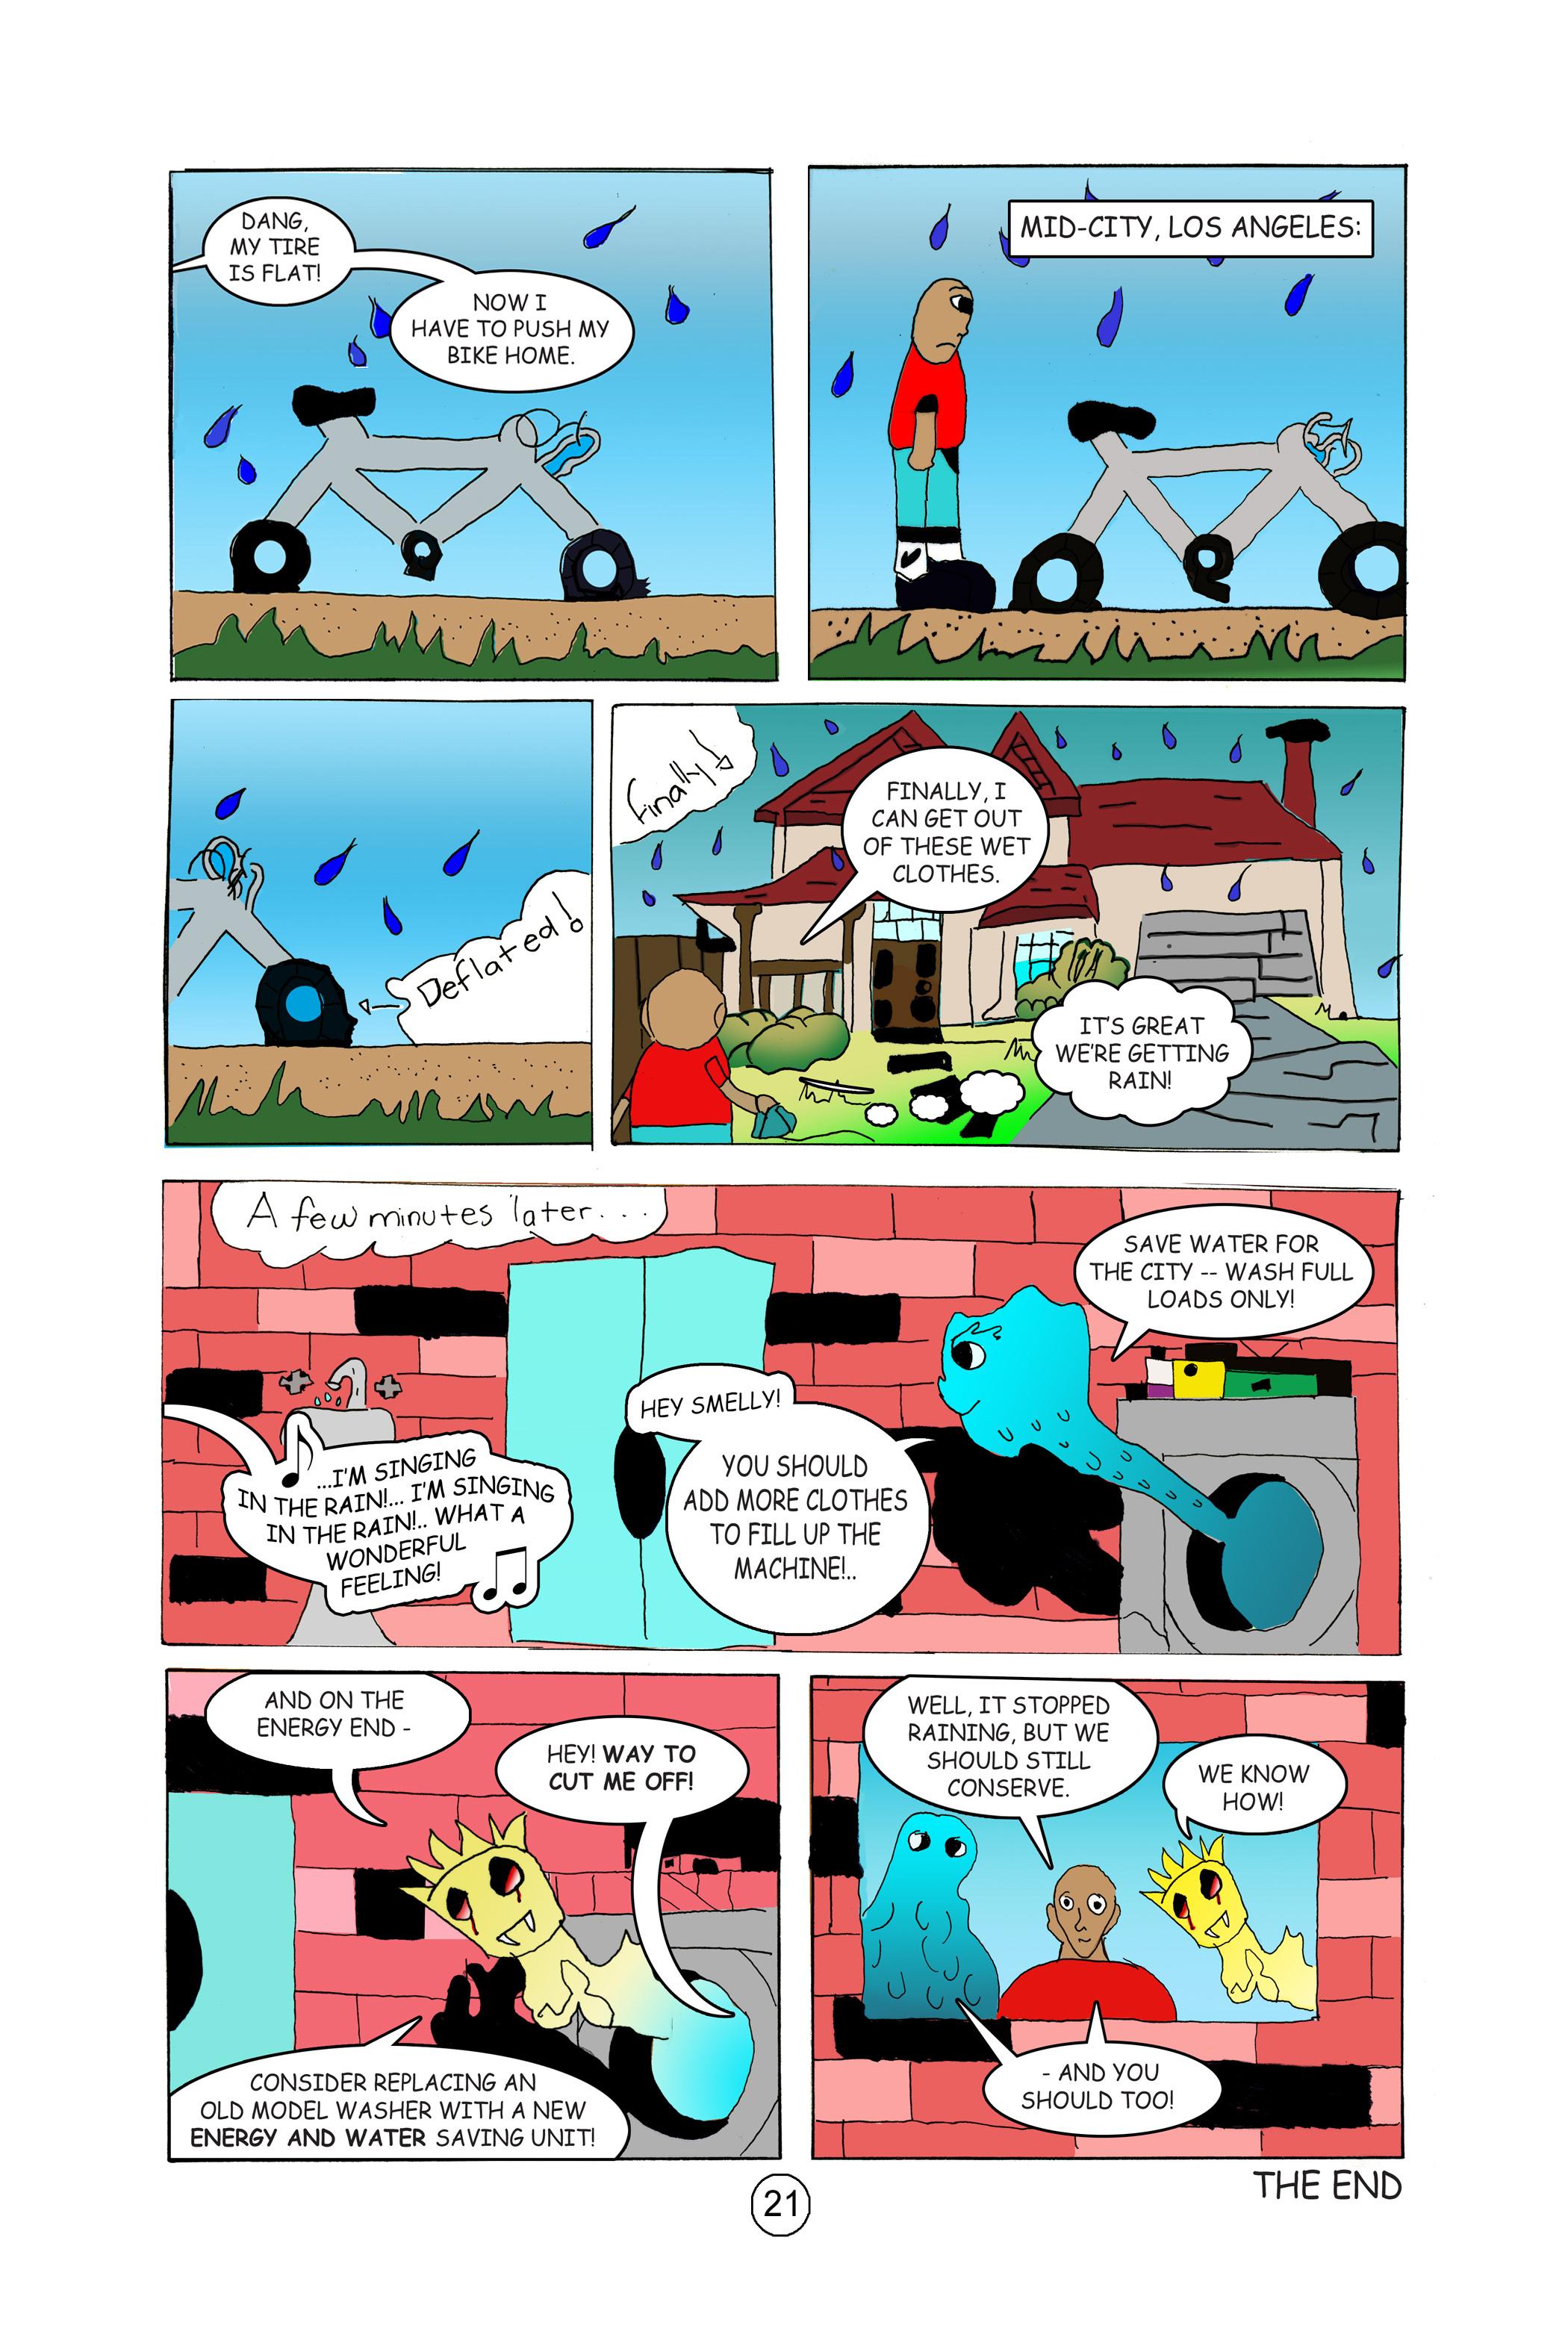 EVWP-Comic-Page-21.jpg